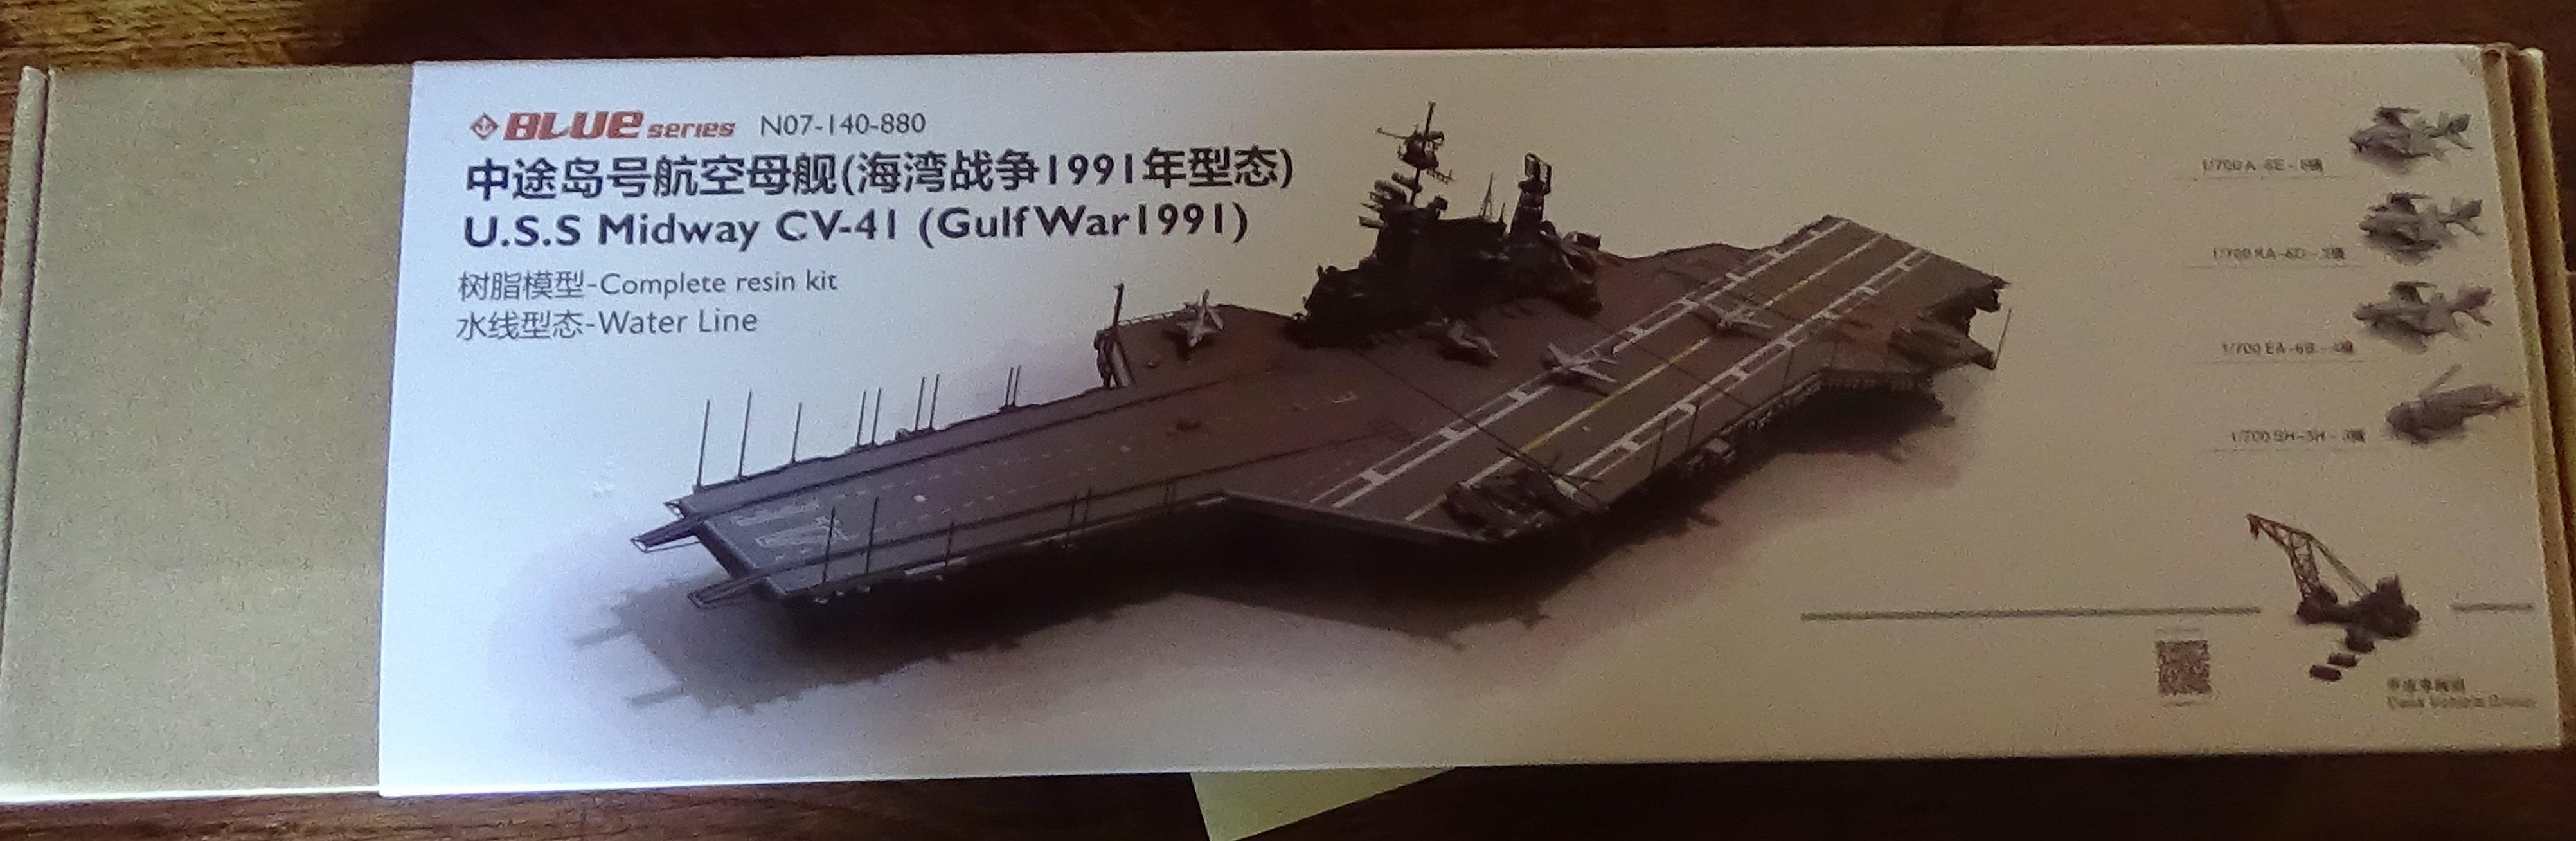 [USS Midway CVA-41] Porte avions lourd américain-700e-Orange Hobby 17071905021223134915155985